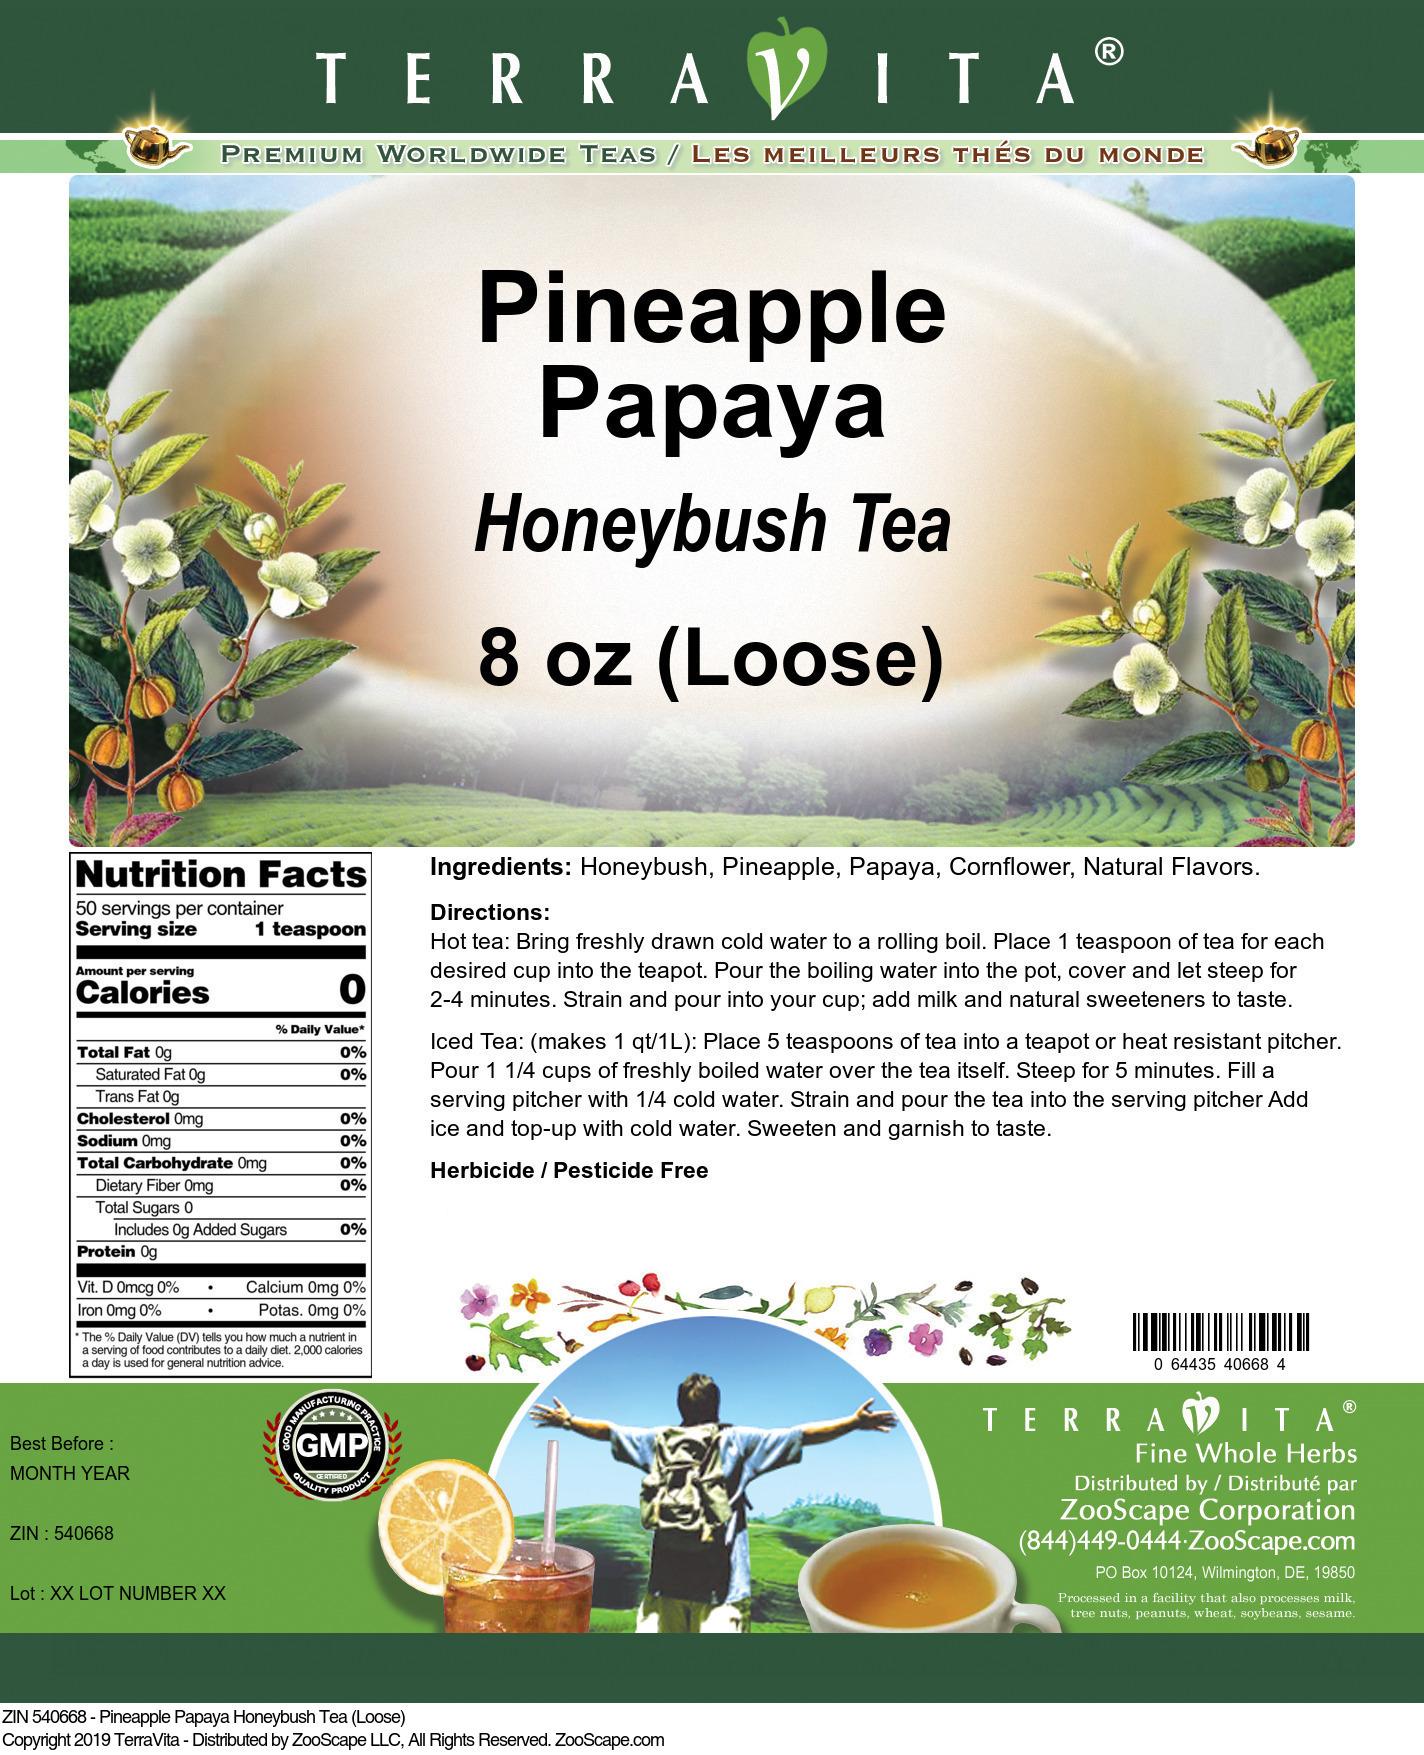 Pineapple Papaya Honeybush Tea (Loose)